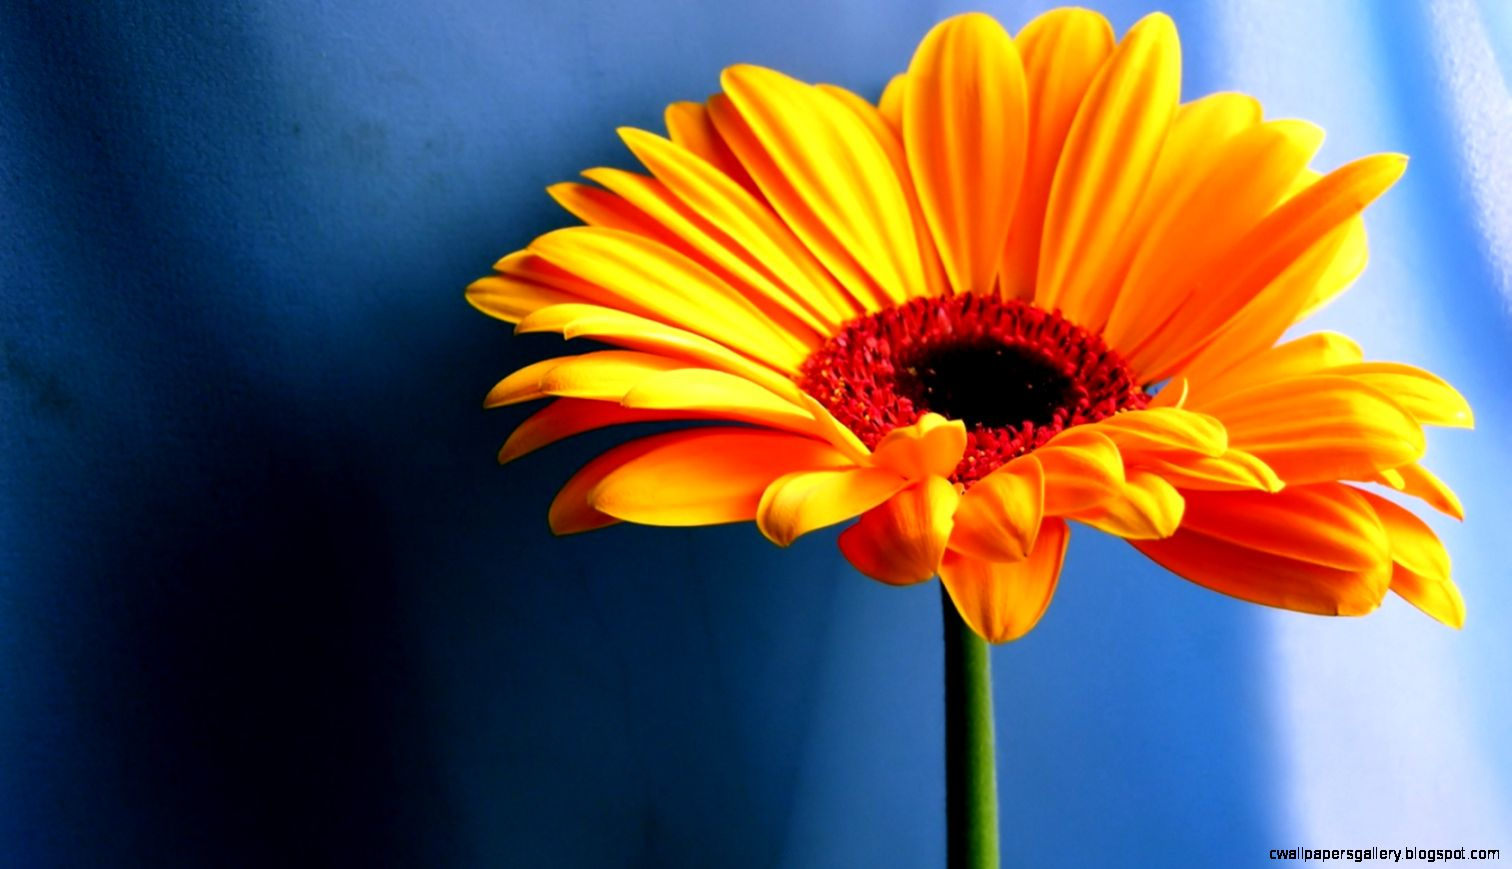 Collection of Flower Desktop Wallpaper Images on